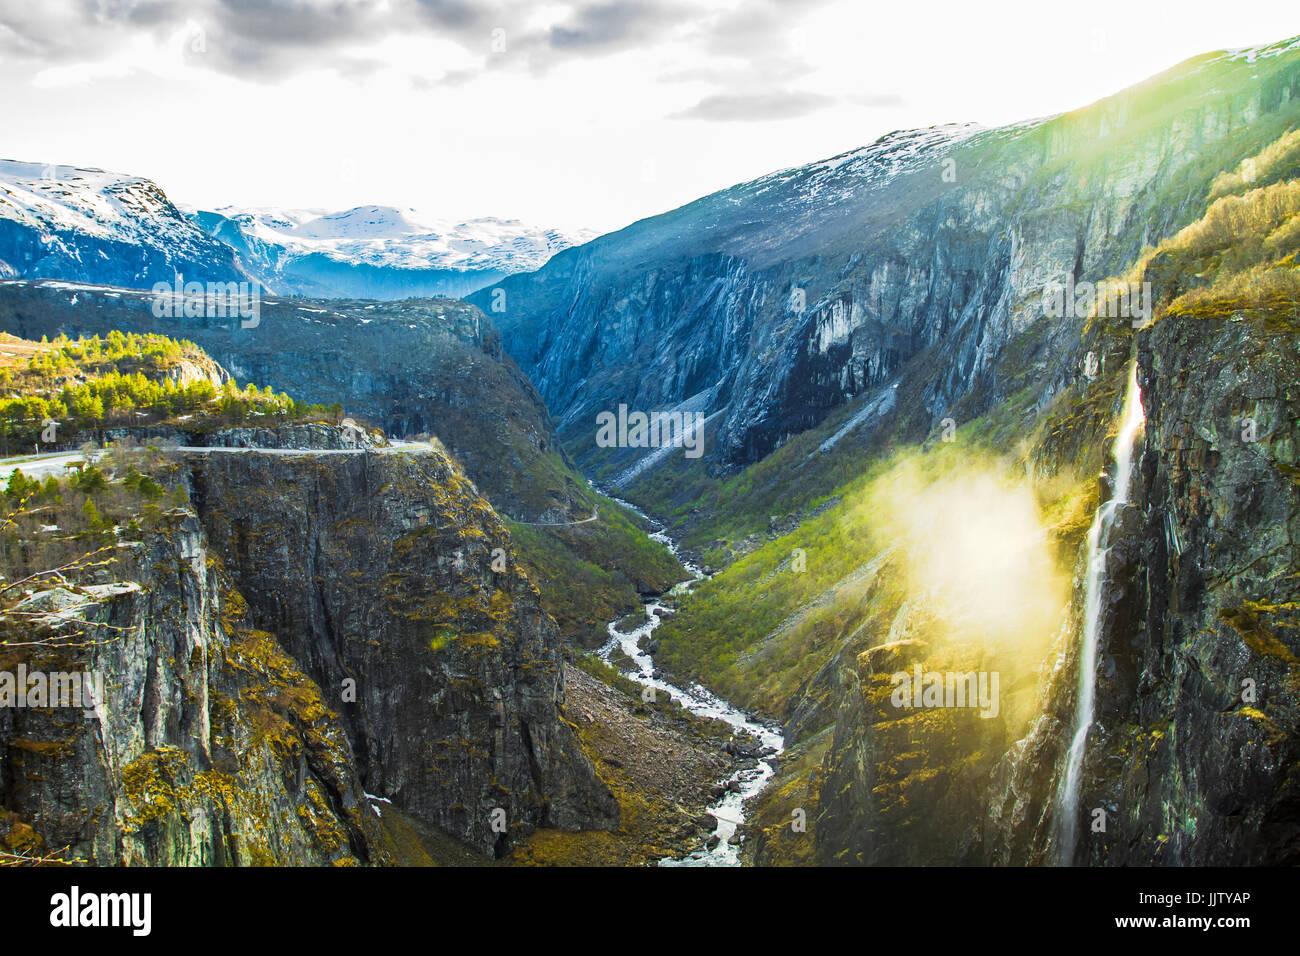 Voringsfossen Waterfall. Hordaland, Norway. - Stock Image